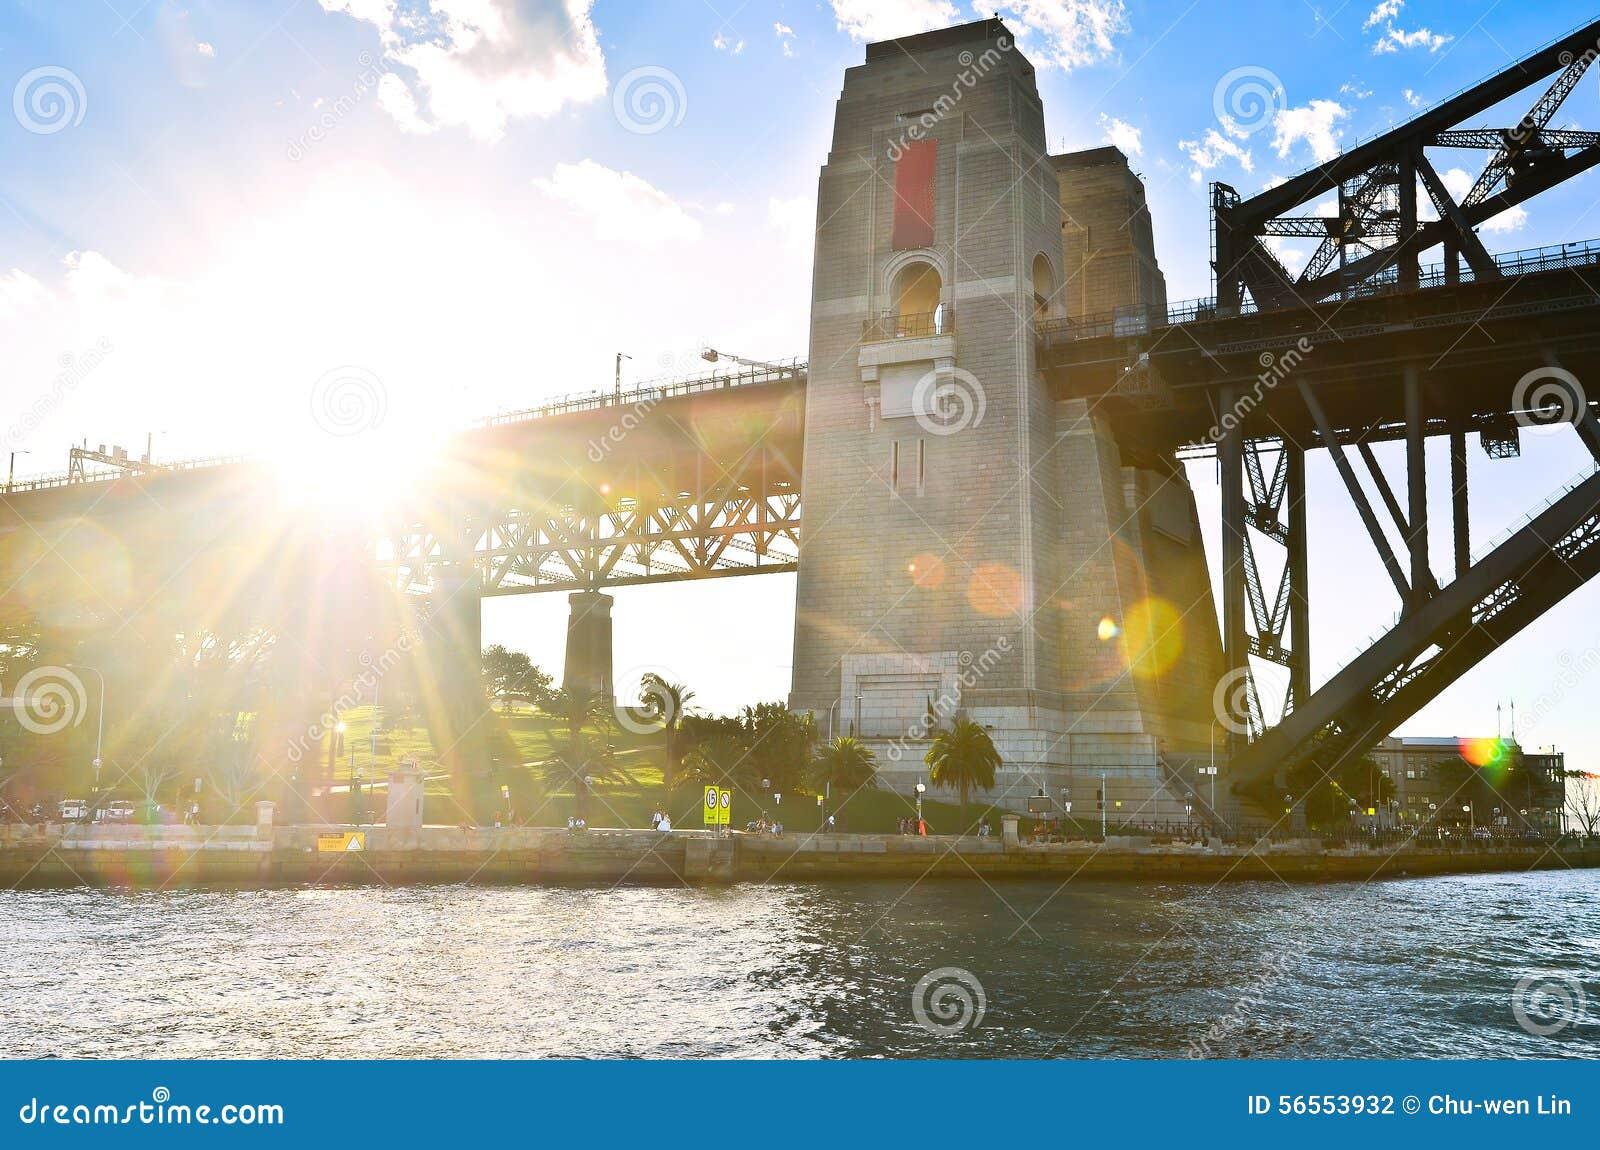 Download Λιμενική γέφυρα του Σίδνεϊ στο ηλιοβασίλεμα Στοκ Εικόνες - εικόνα από νέος, προγεφυρωμάτων: 56553932